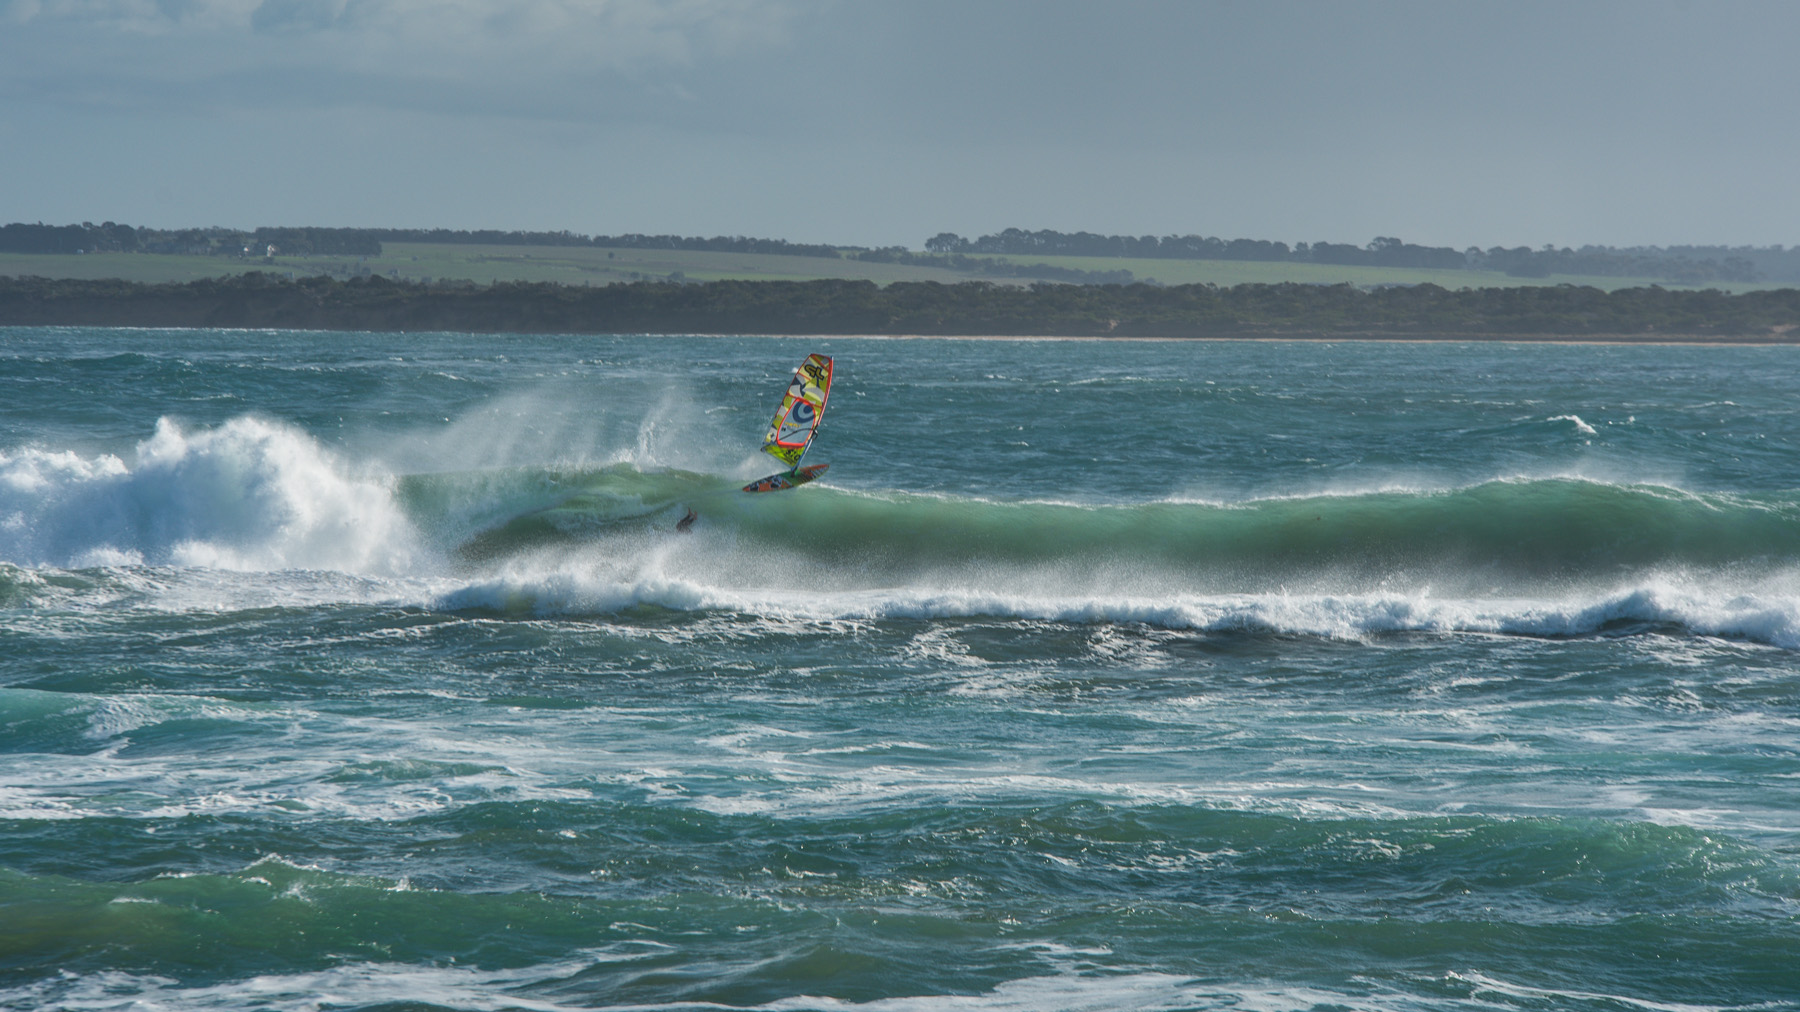 alastair mcleod windsurfing quarantine mornington peninsula victoria